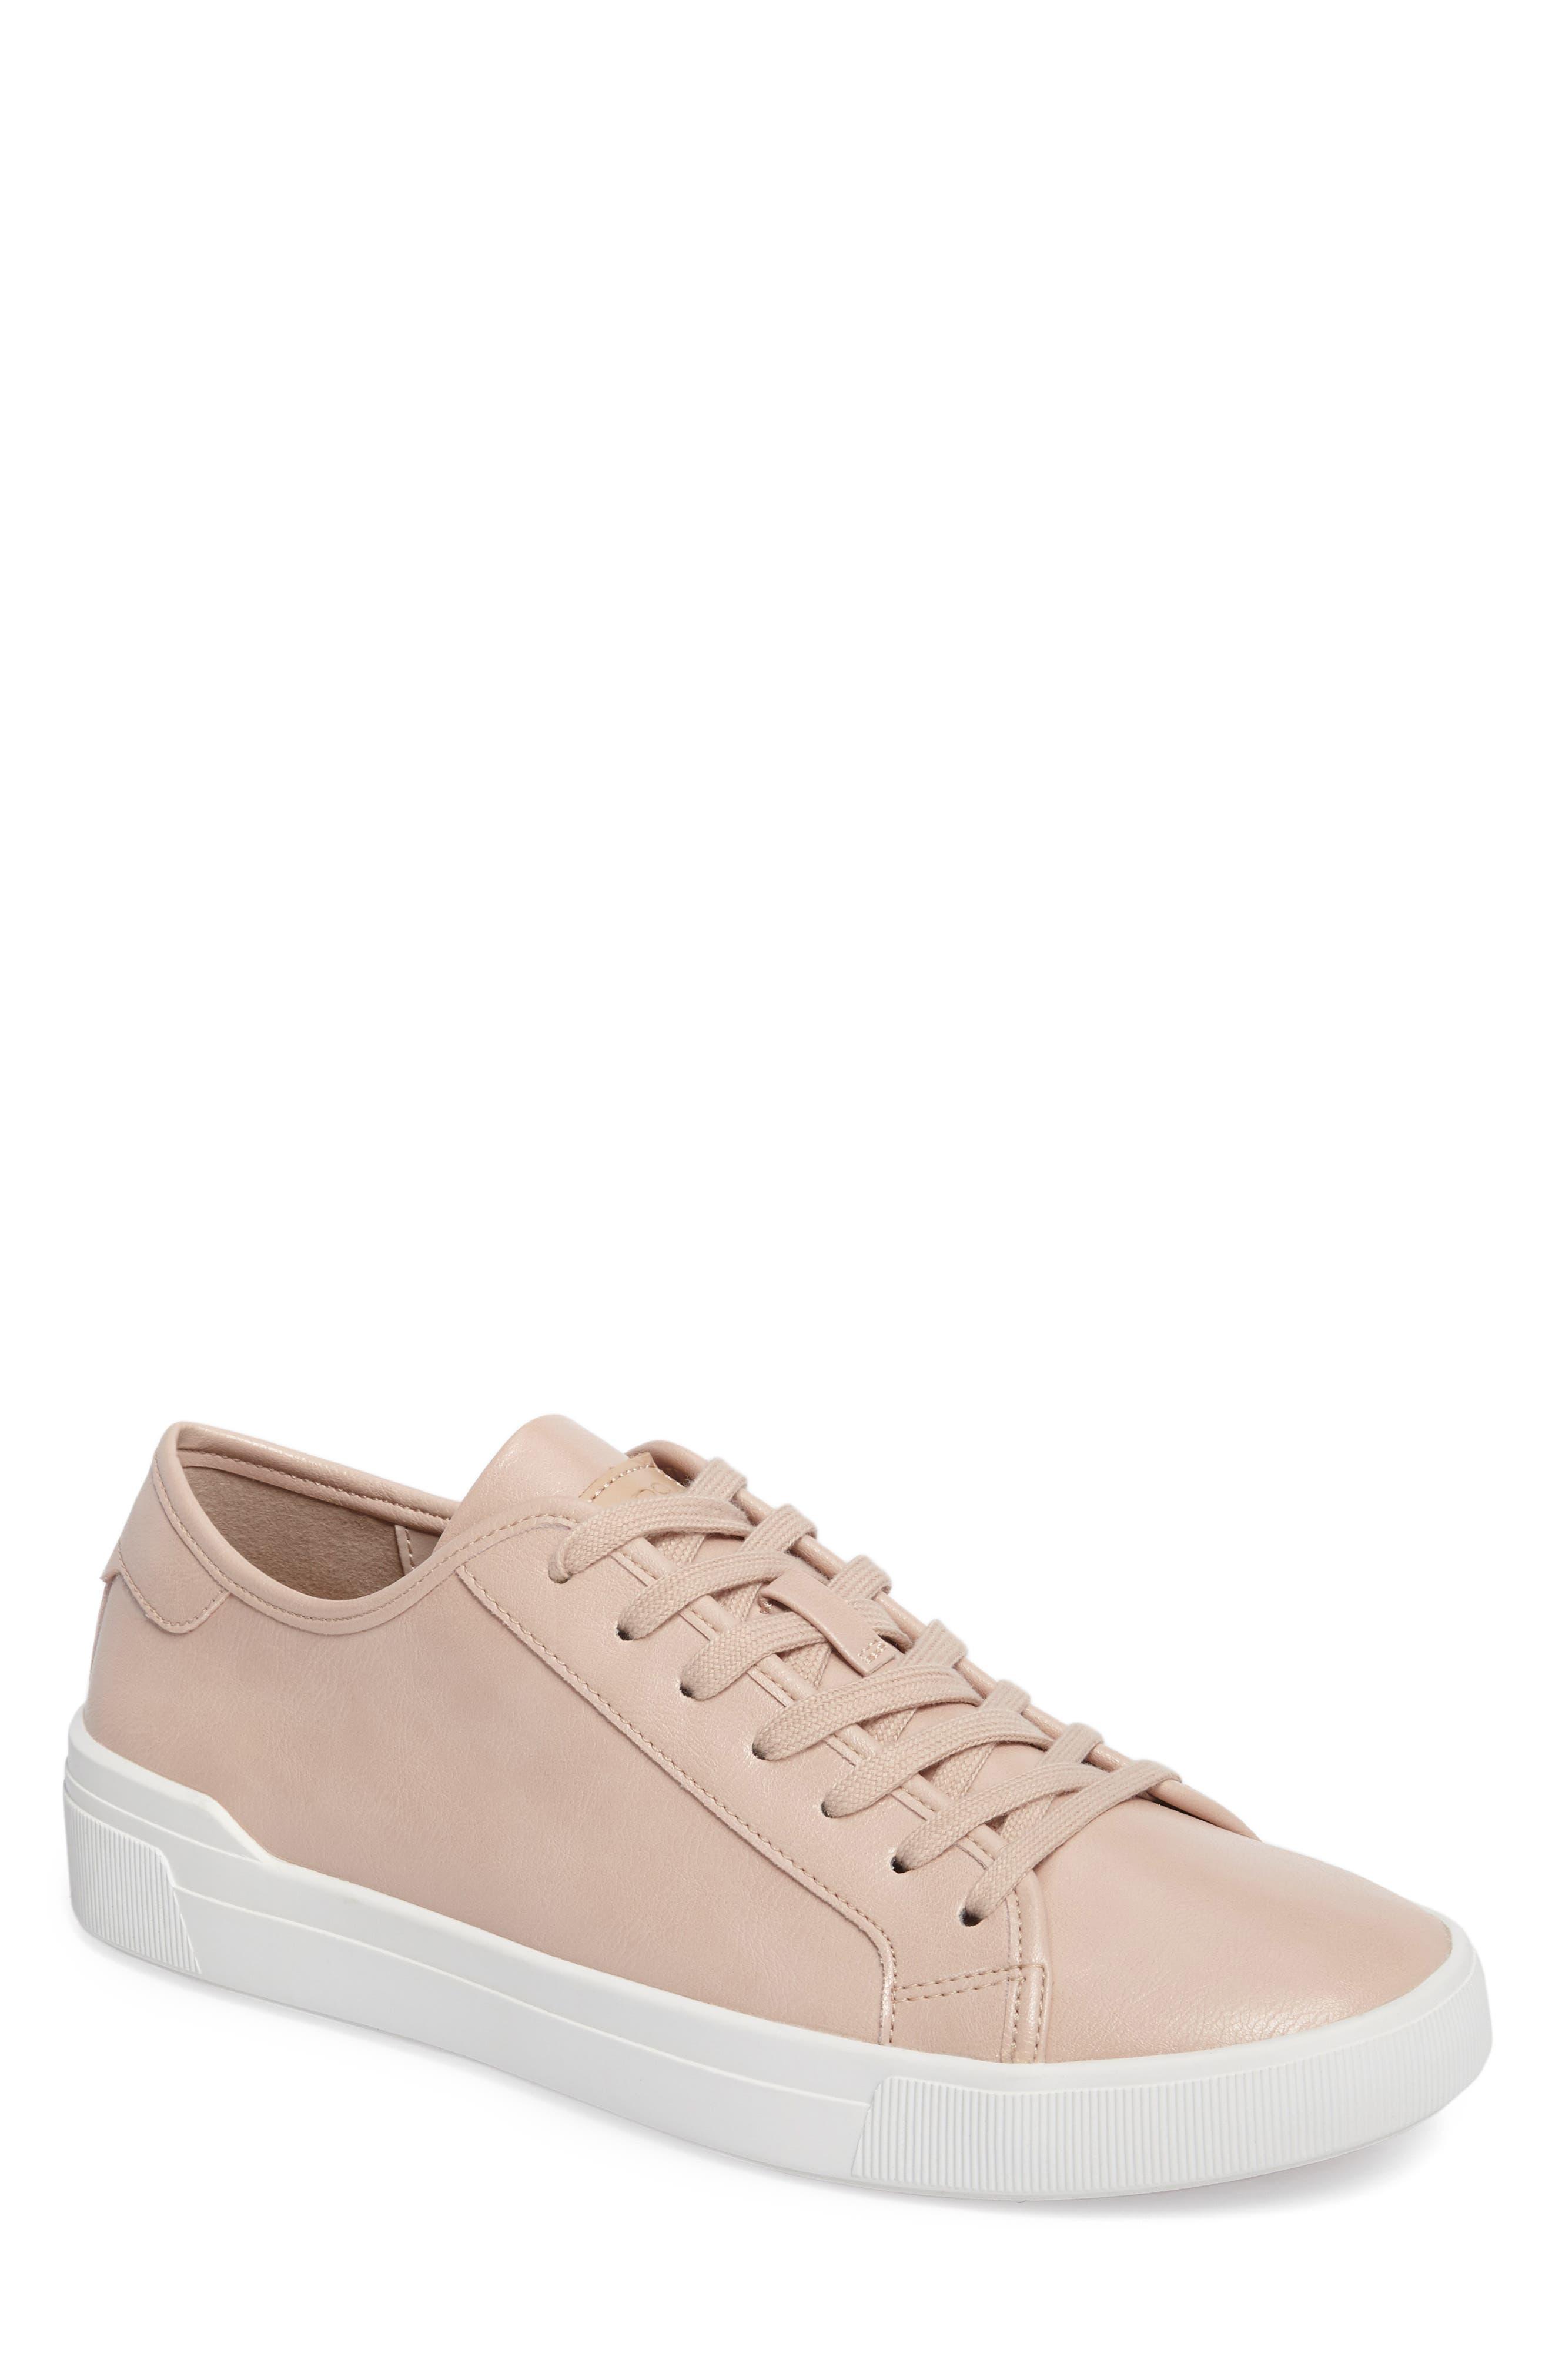 Main Image - ALDO Haener Sneaker (Men)